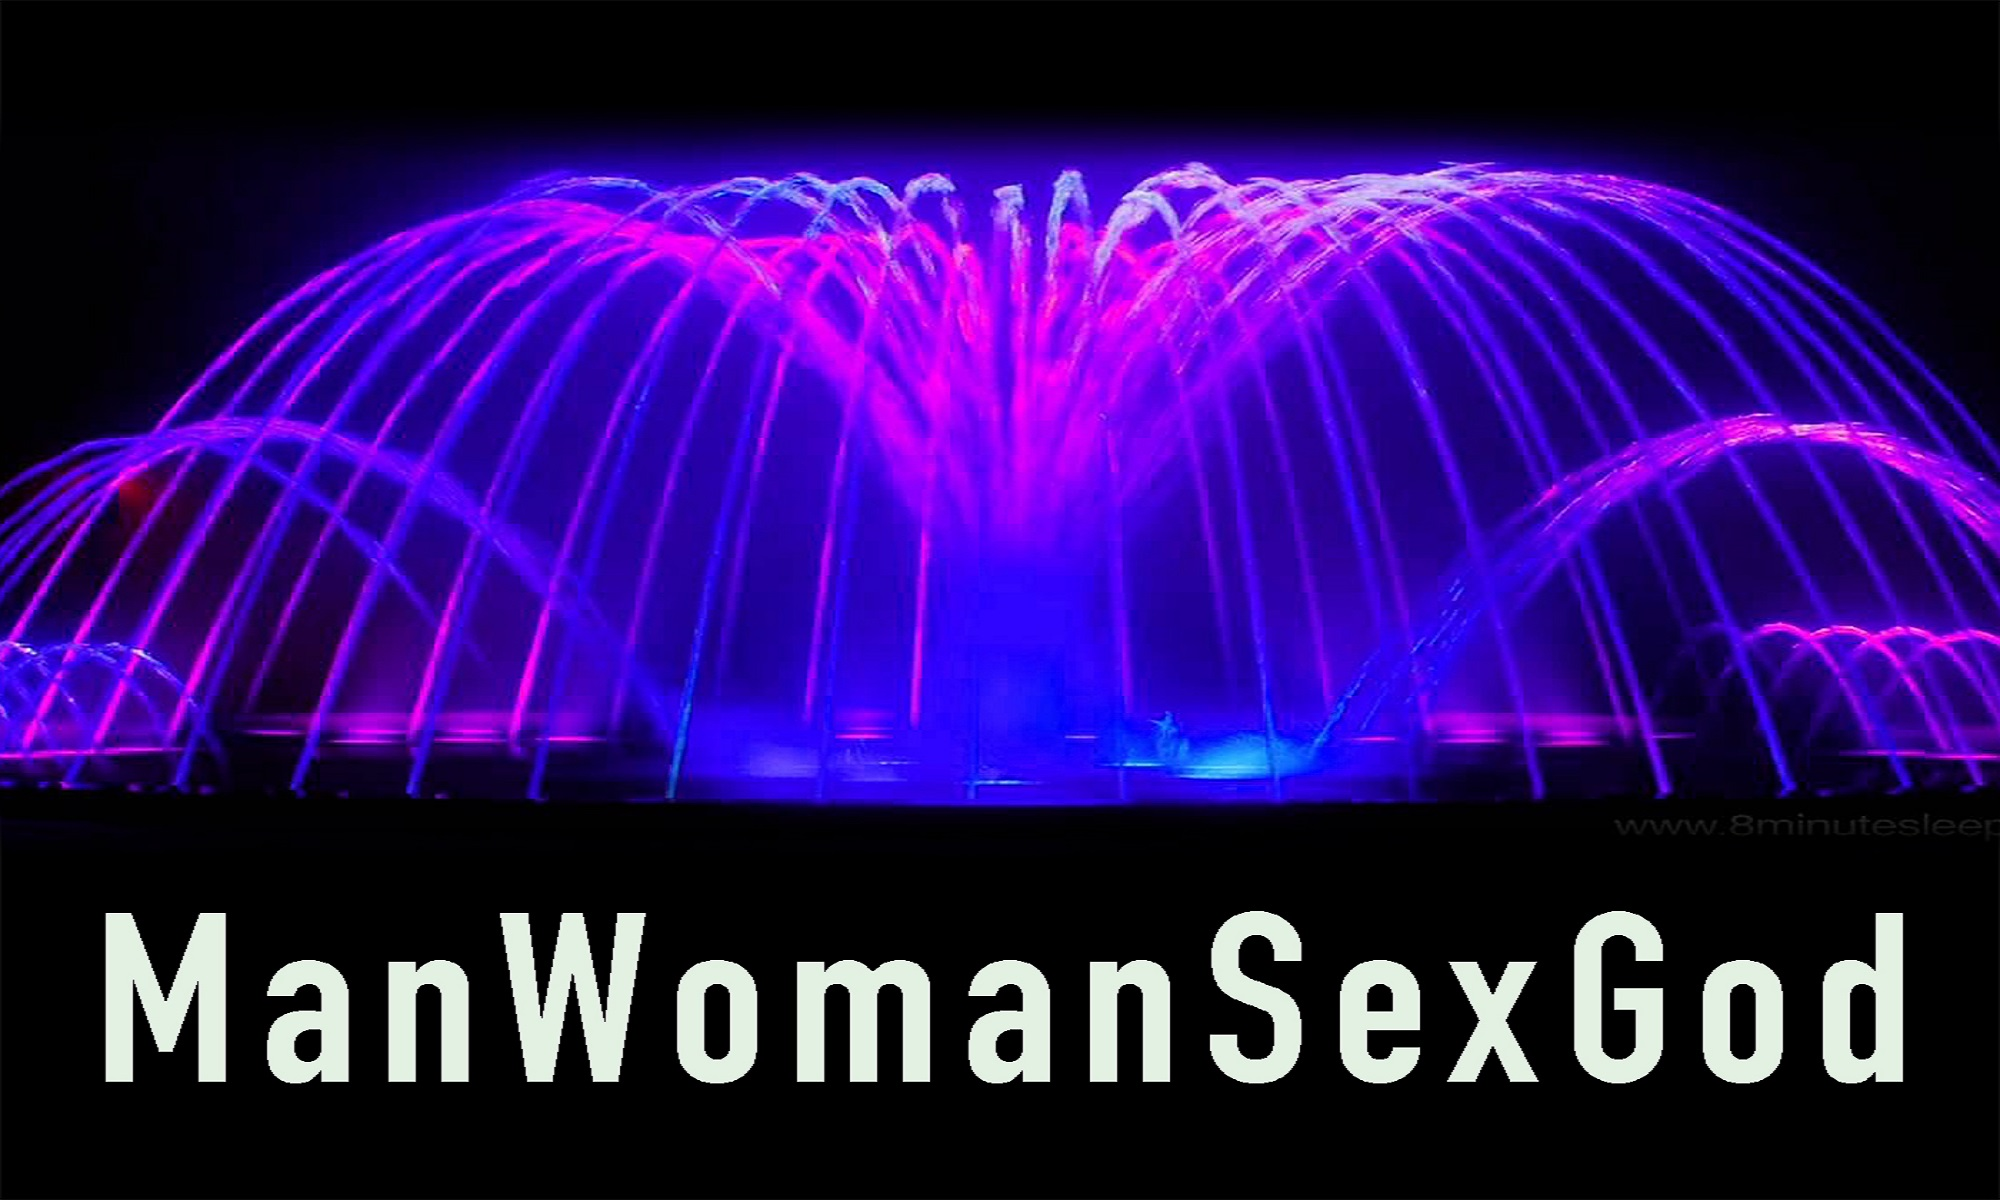 ManWomanSexGod